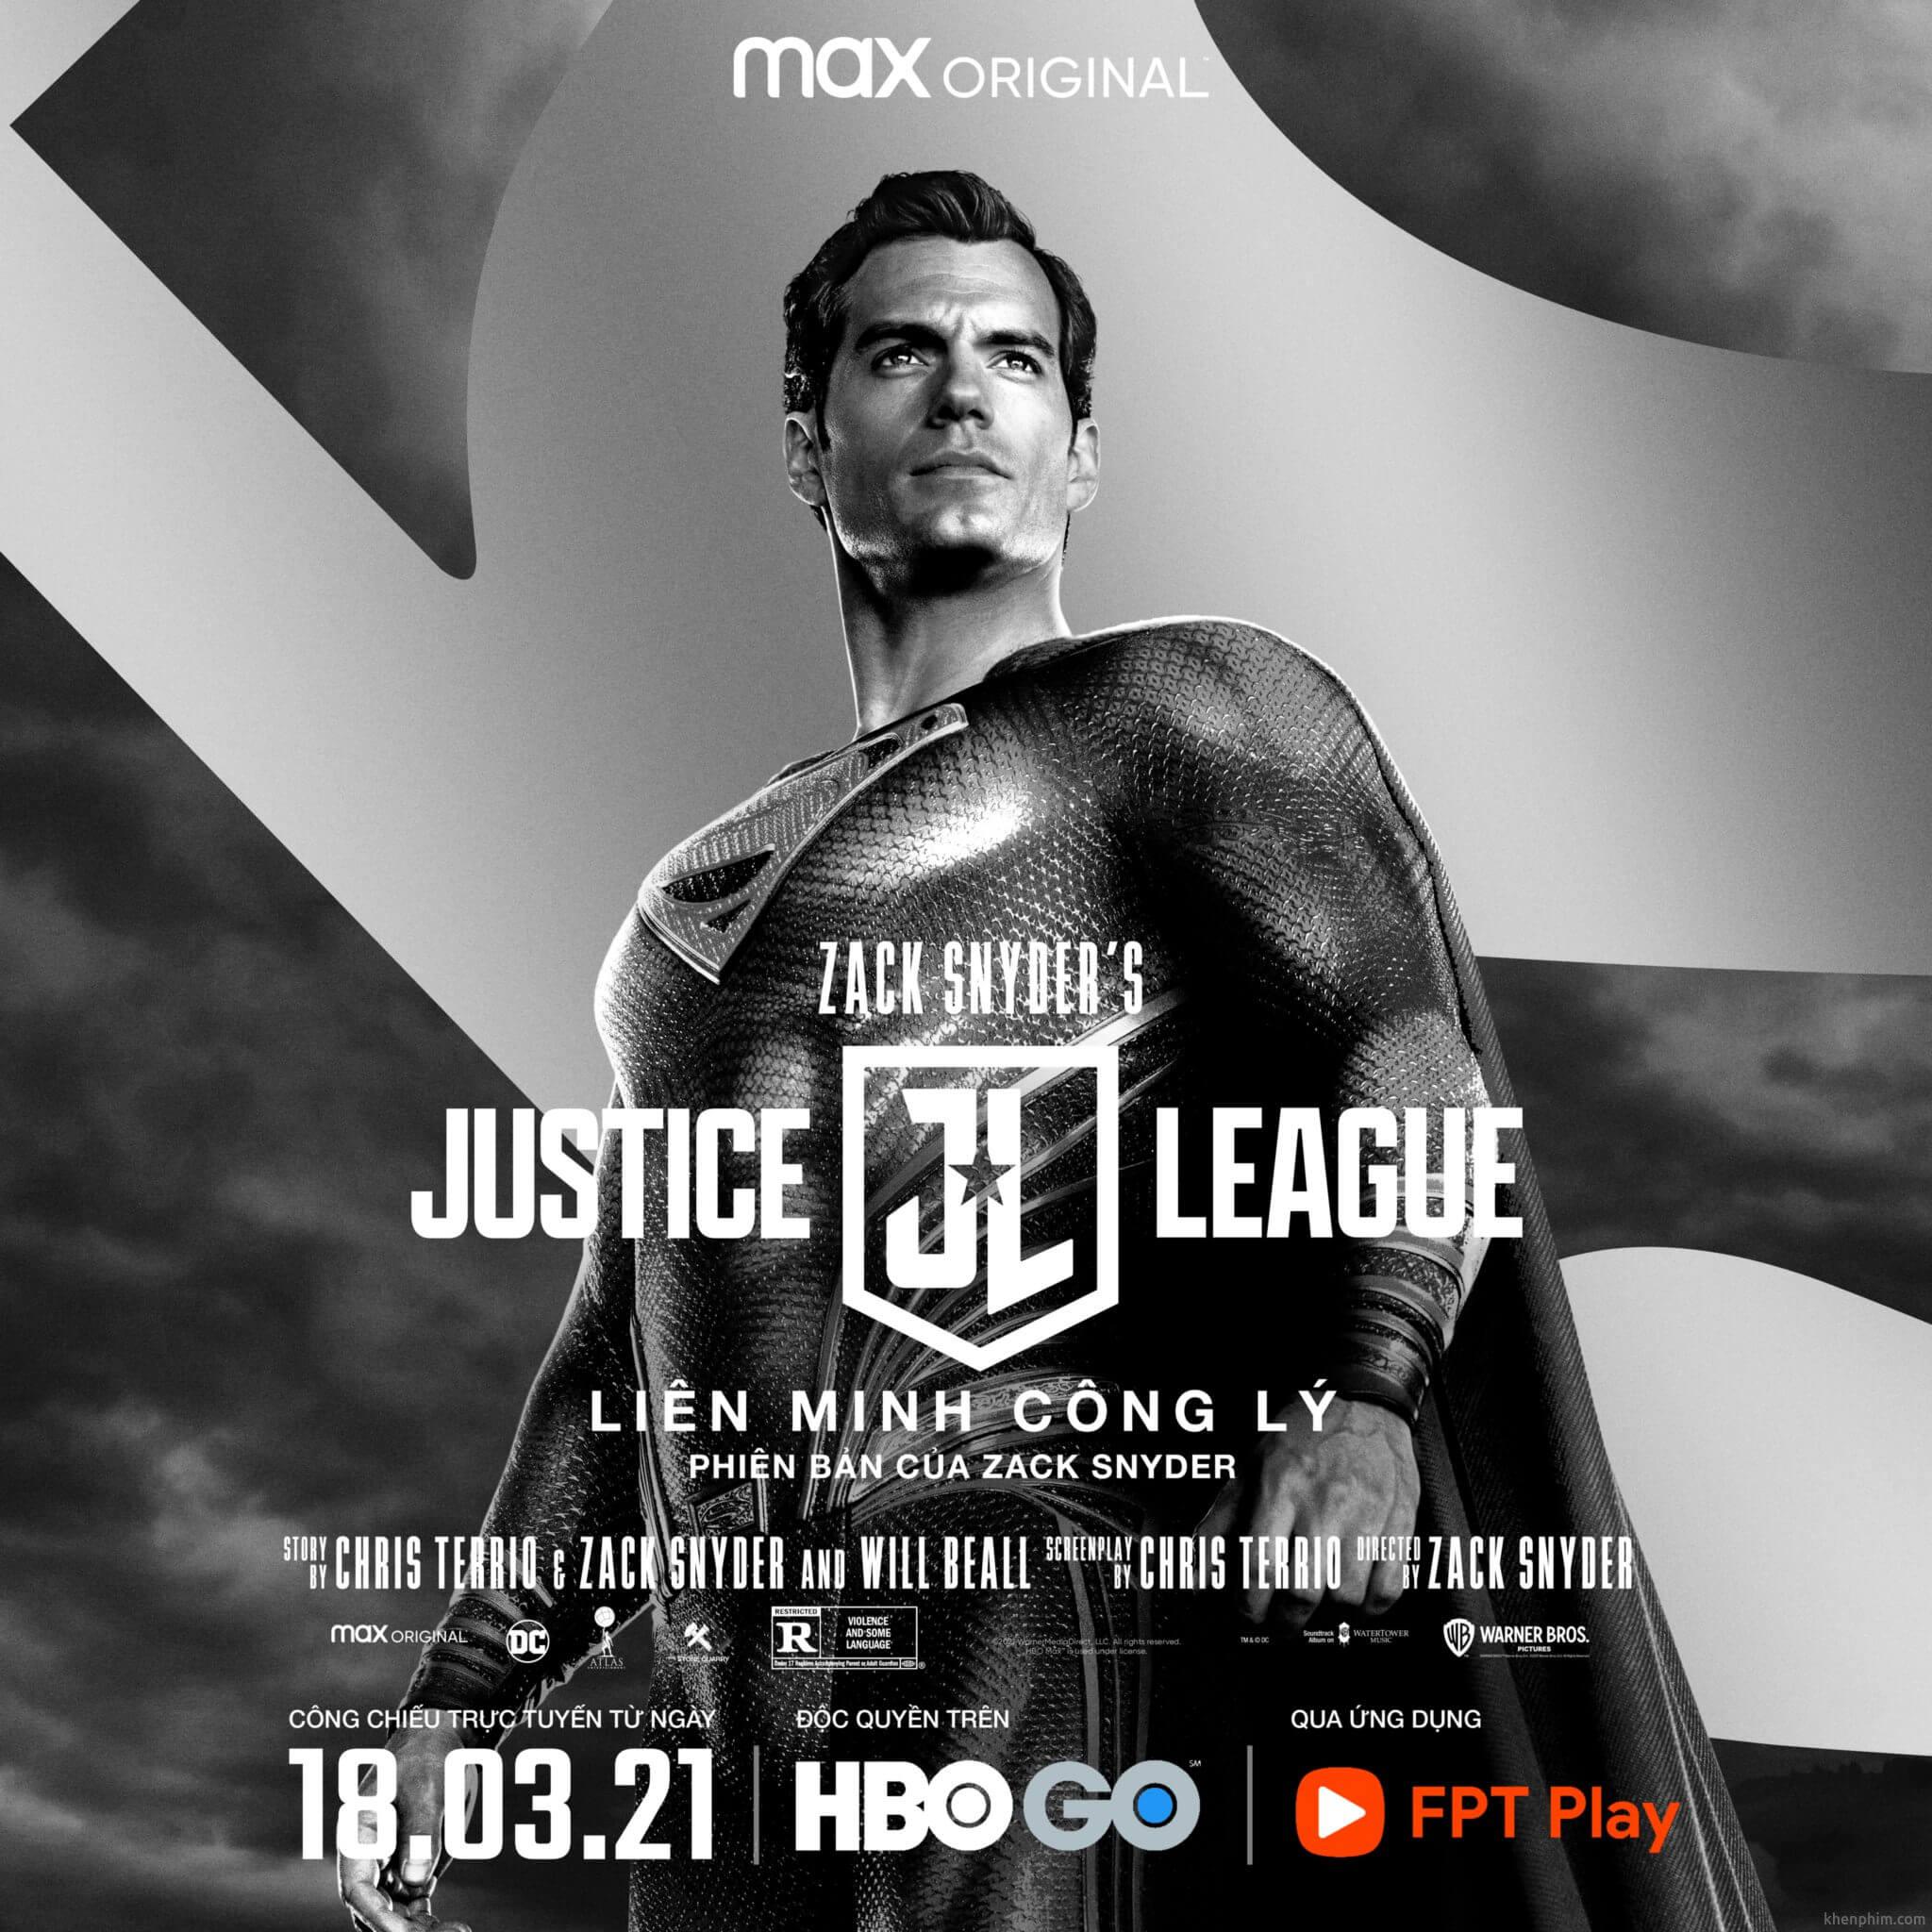 Poster nhân vật trong phim Zack Snyder's Justice League - Superman